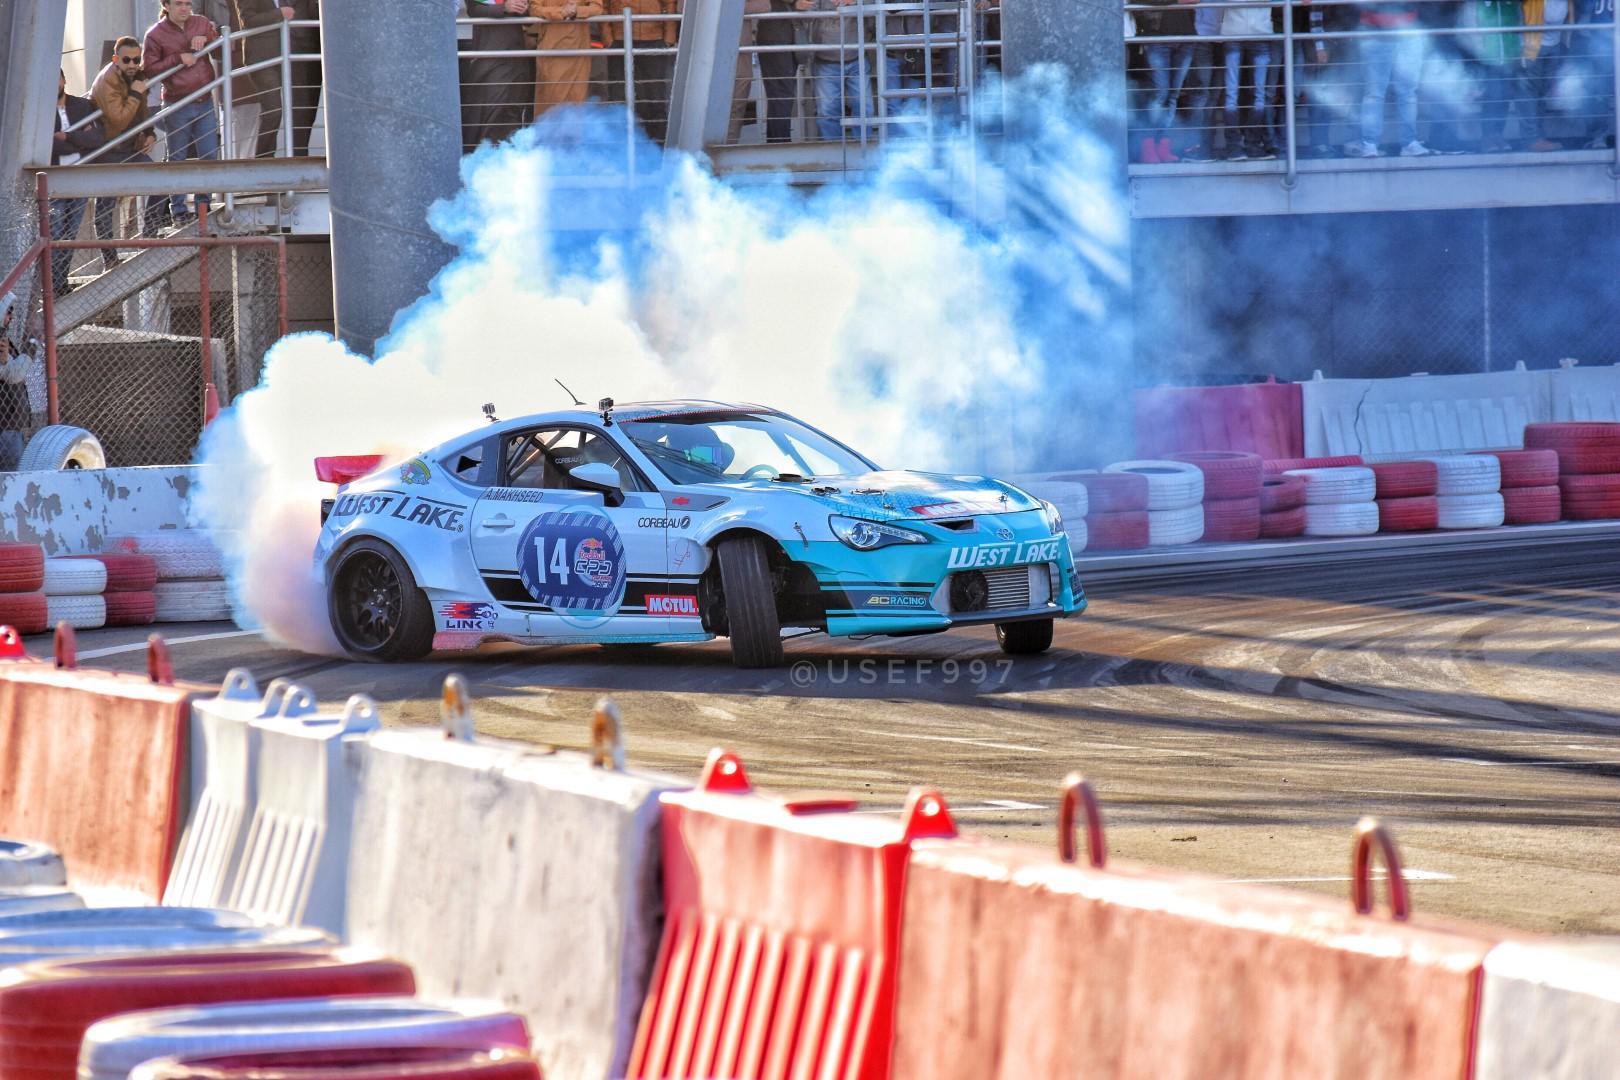 finale-red-bull-car-park-drift-2017-ait-mansour-15eme-487-6.jpg